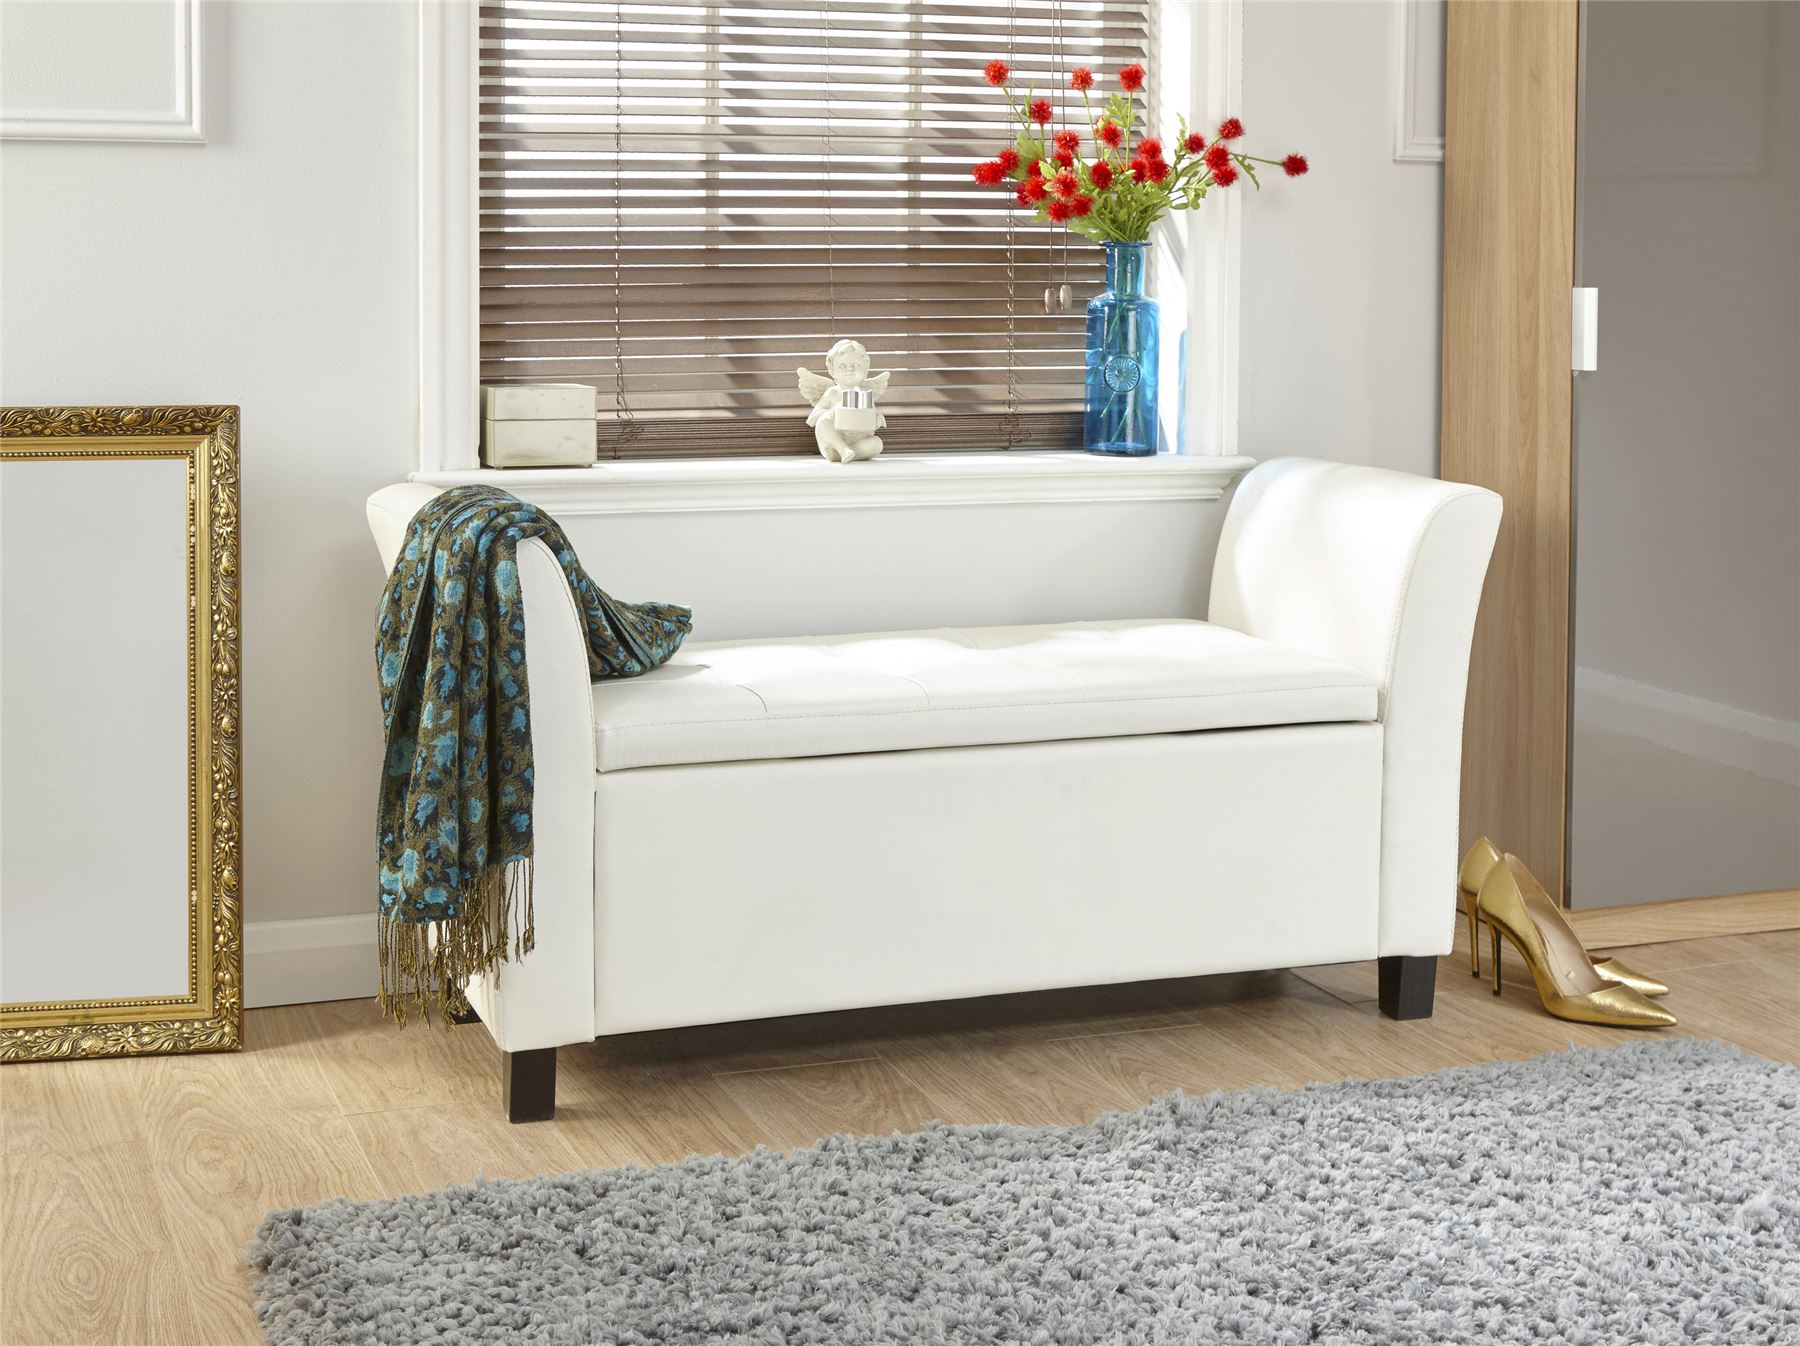 Verona Leather Window Seat Ottoman Storage Box Large Blanket Box Bench Footstool Ebay